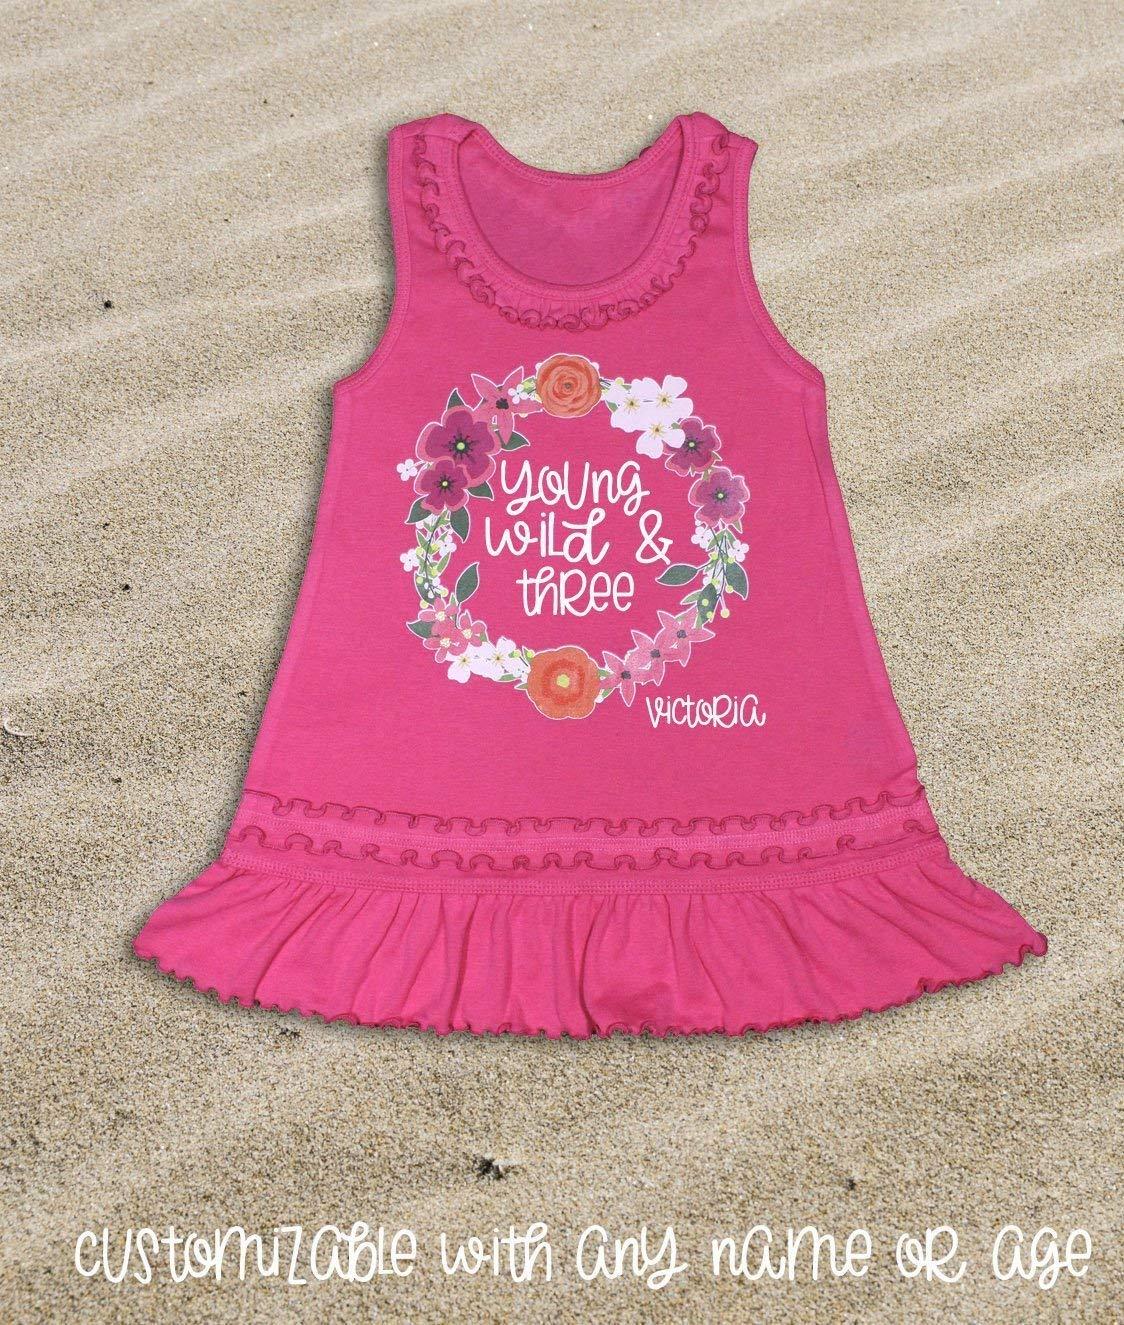 cceeebc58 Cheap 2 Year Old Birthday Dress